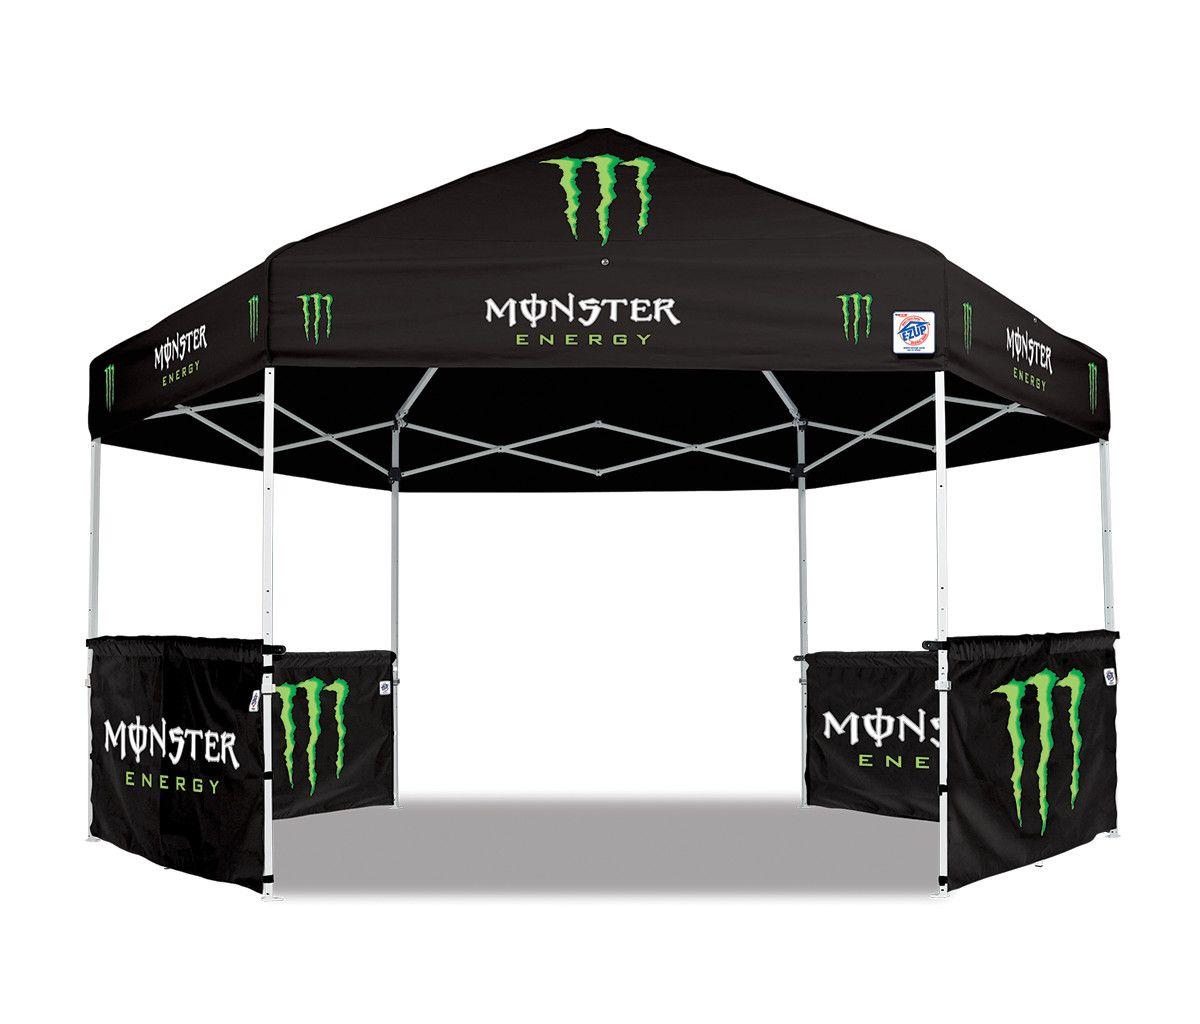 custom event tents  sc 1 st  Pinterest & custom event tents | Custom Event Tents | Pinterest | Tents